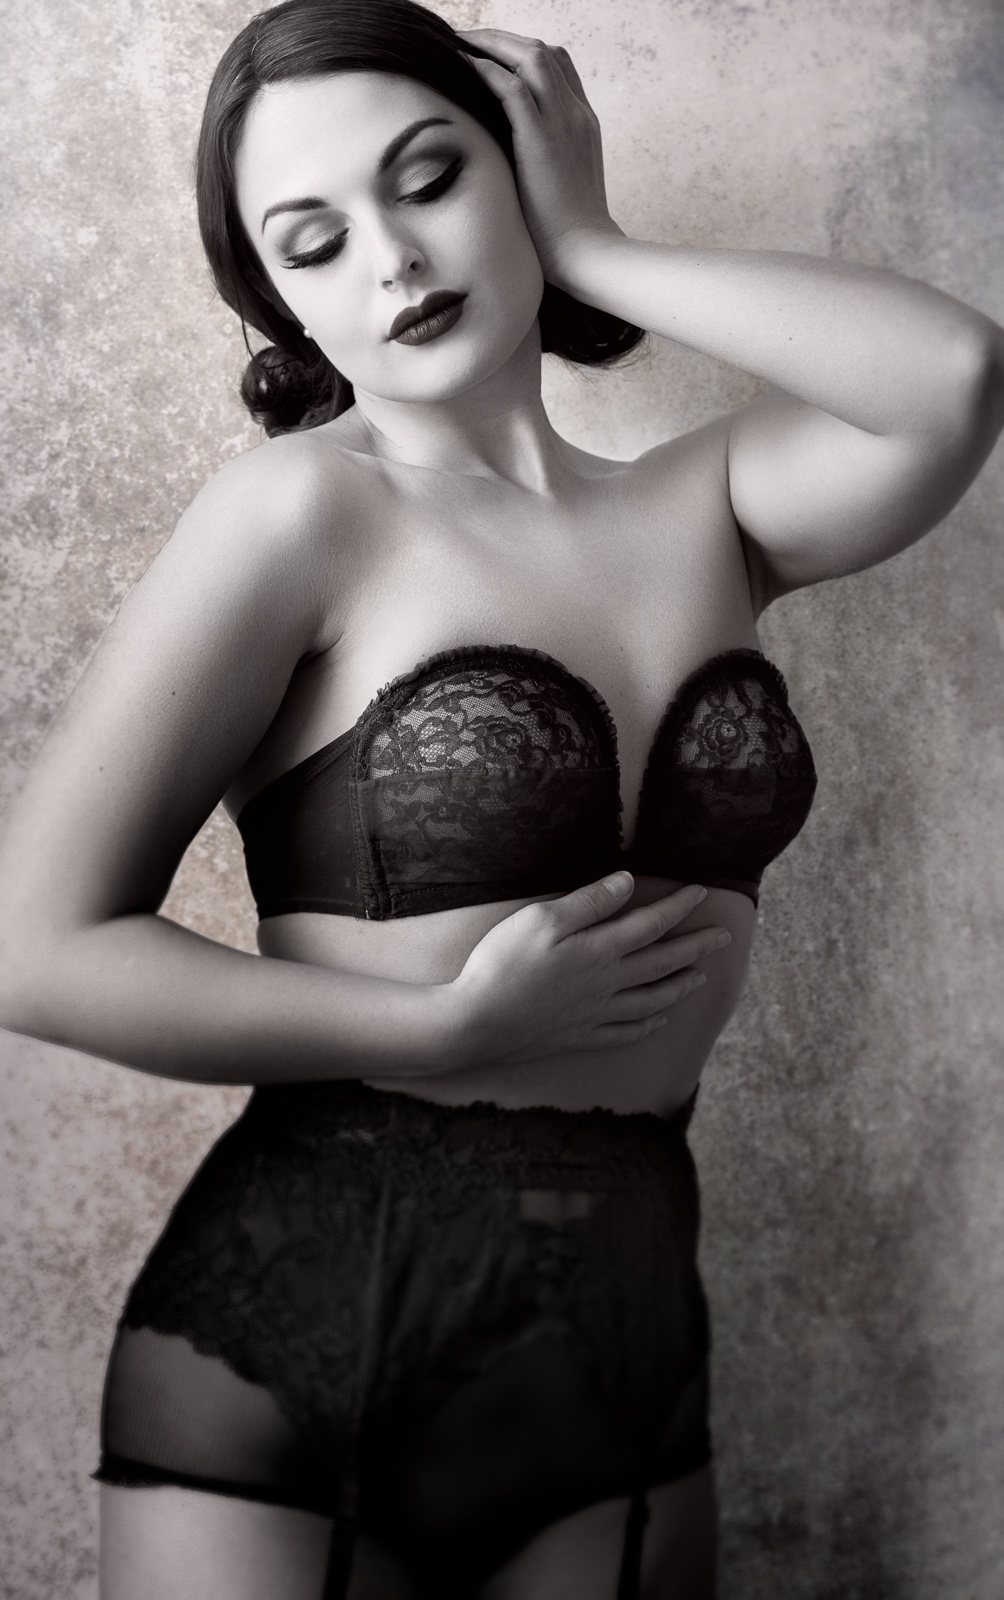 James Pitarresi - Anastasia Arteyeva - makeup is model